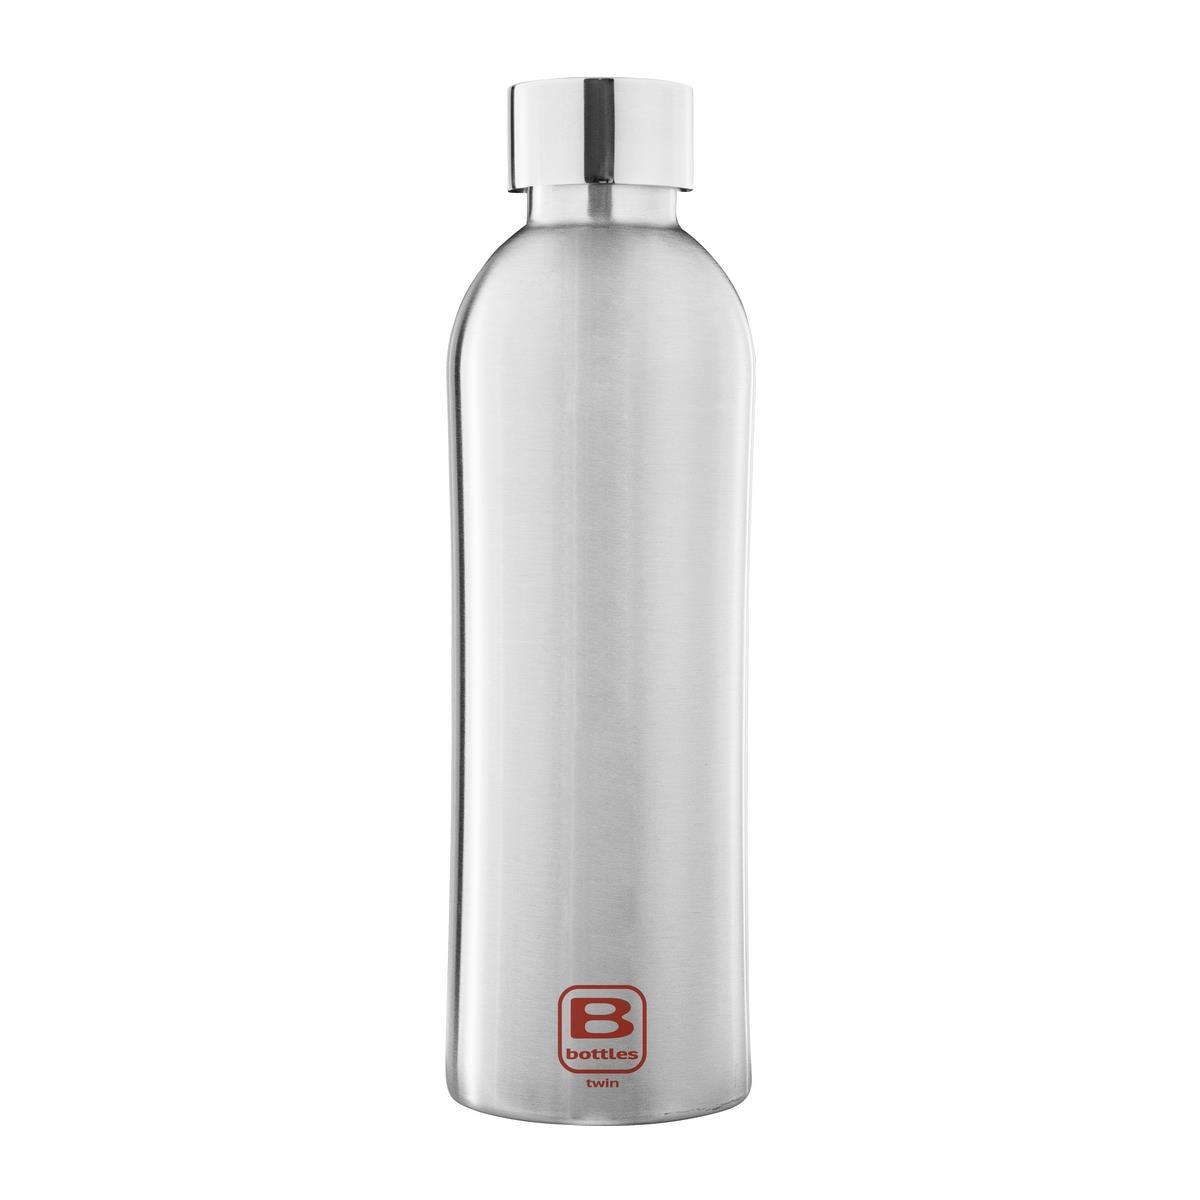 B Bottles Twin - Steel Brushed - 800 ml - Bottiglia Termica a doppia parete in acciaio inox 18/10